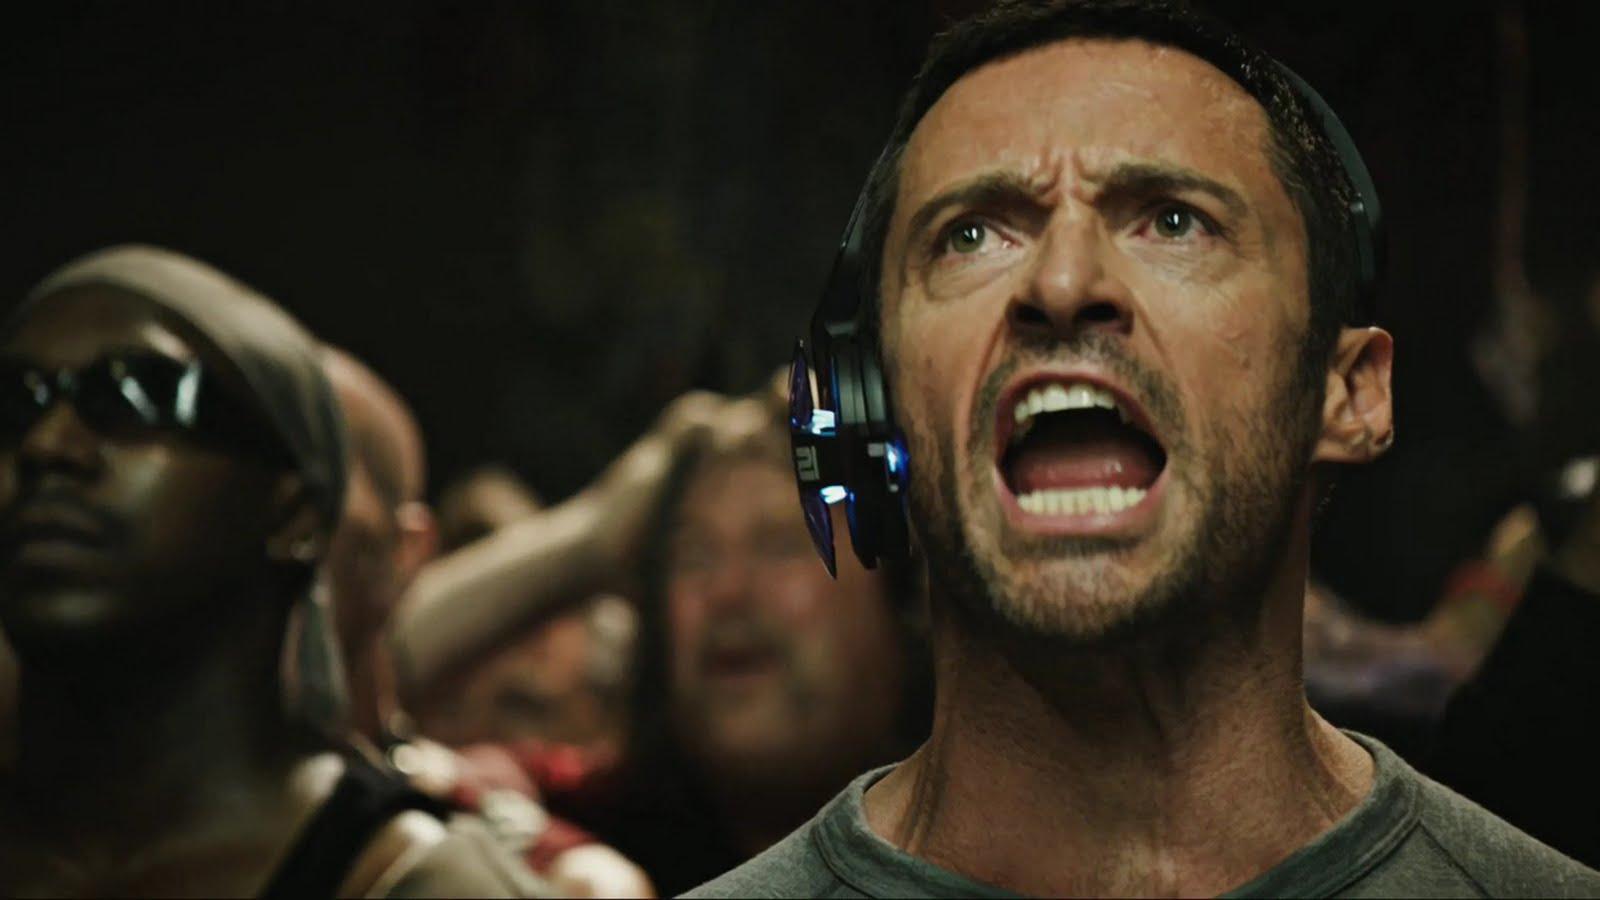 http://4.bp.blogspot.com/-xoMxOBnQVYo/TpXZ1vwjCBI/AAAAAAAACLg/UhsIIcN43Co/s1600/Real-Steel-2011-movie-Hugh_Jackman-10.jpg